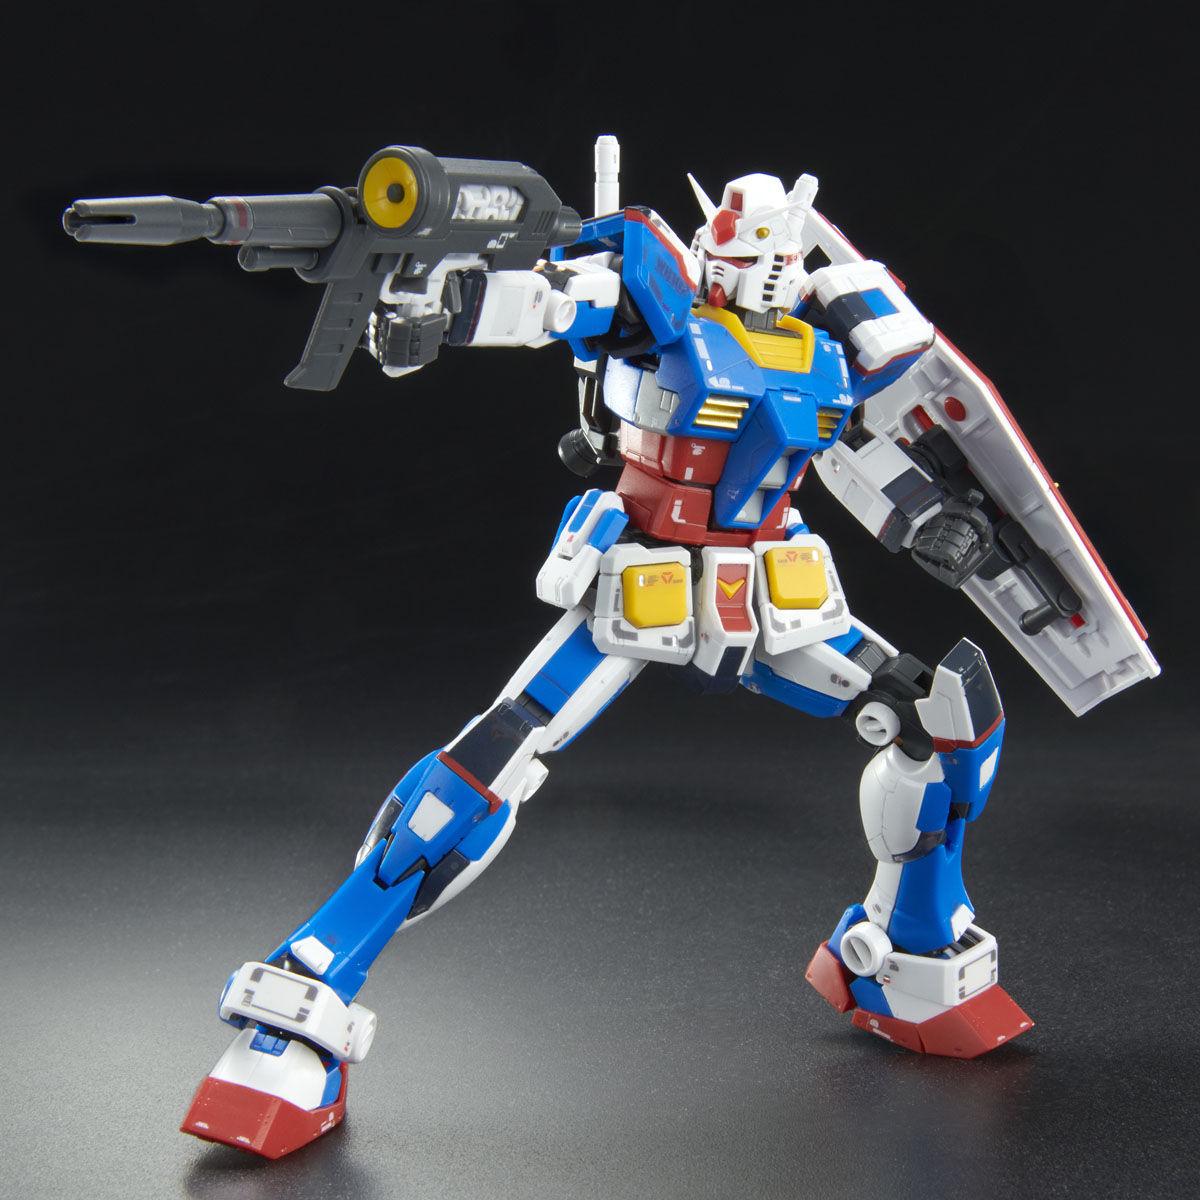 RG 1/144 RX-78-2 GUNDAM (TEAM BRIGHT CUSTOM) [Dec 2021 Delivery]